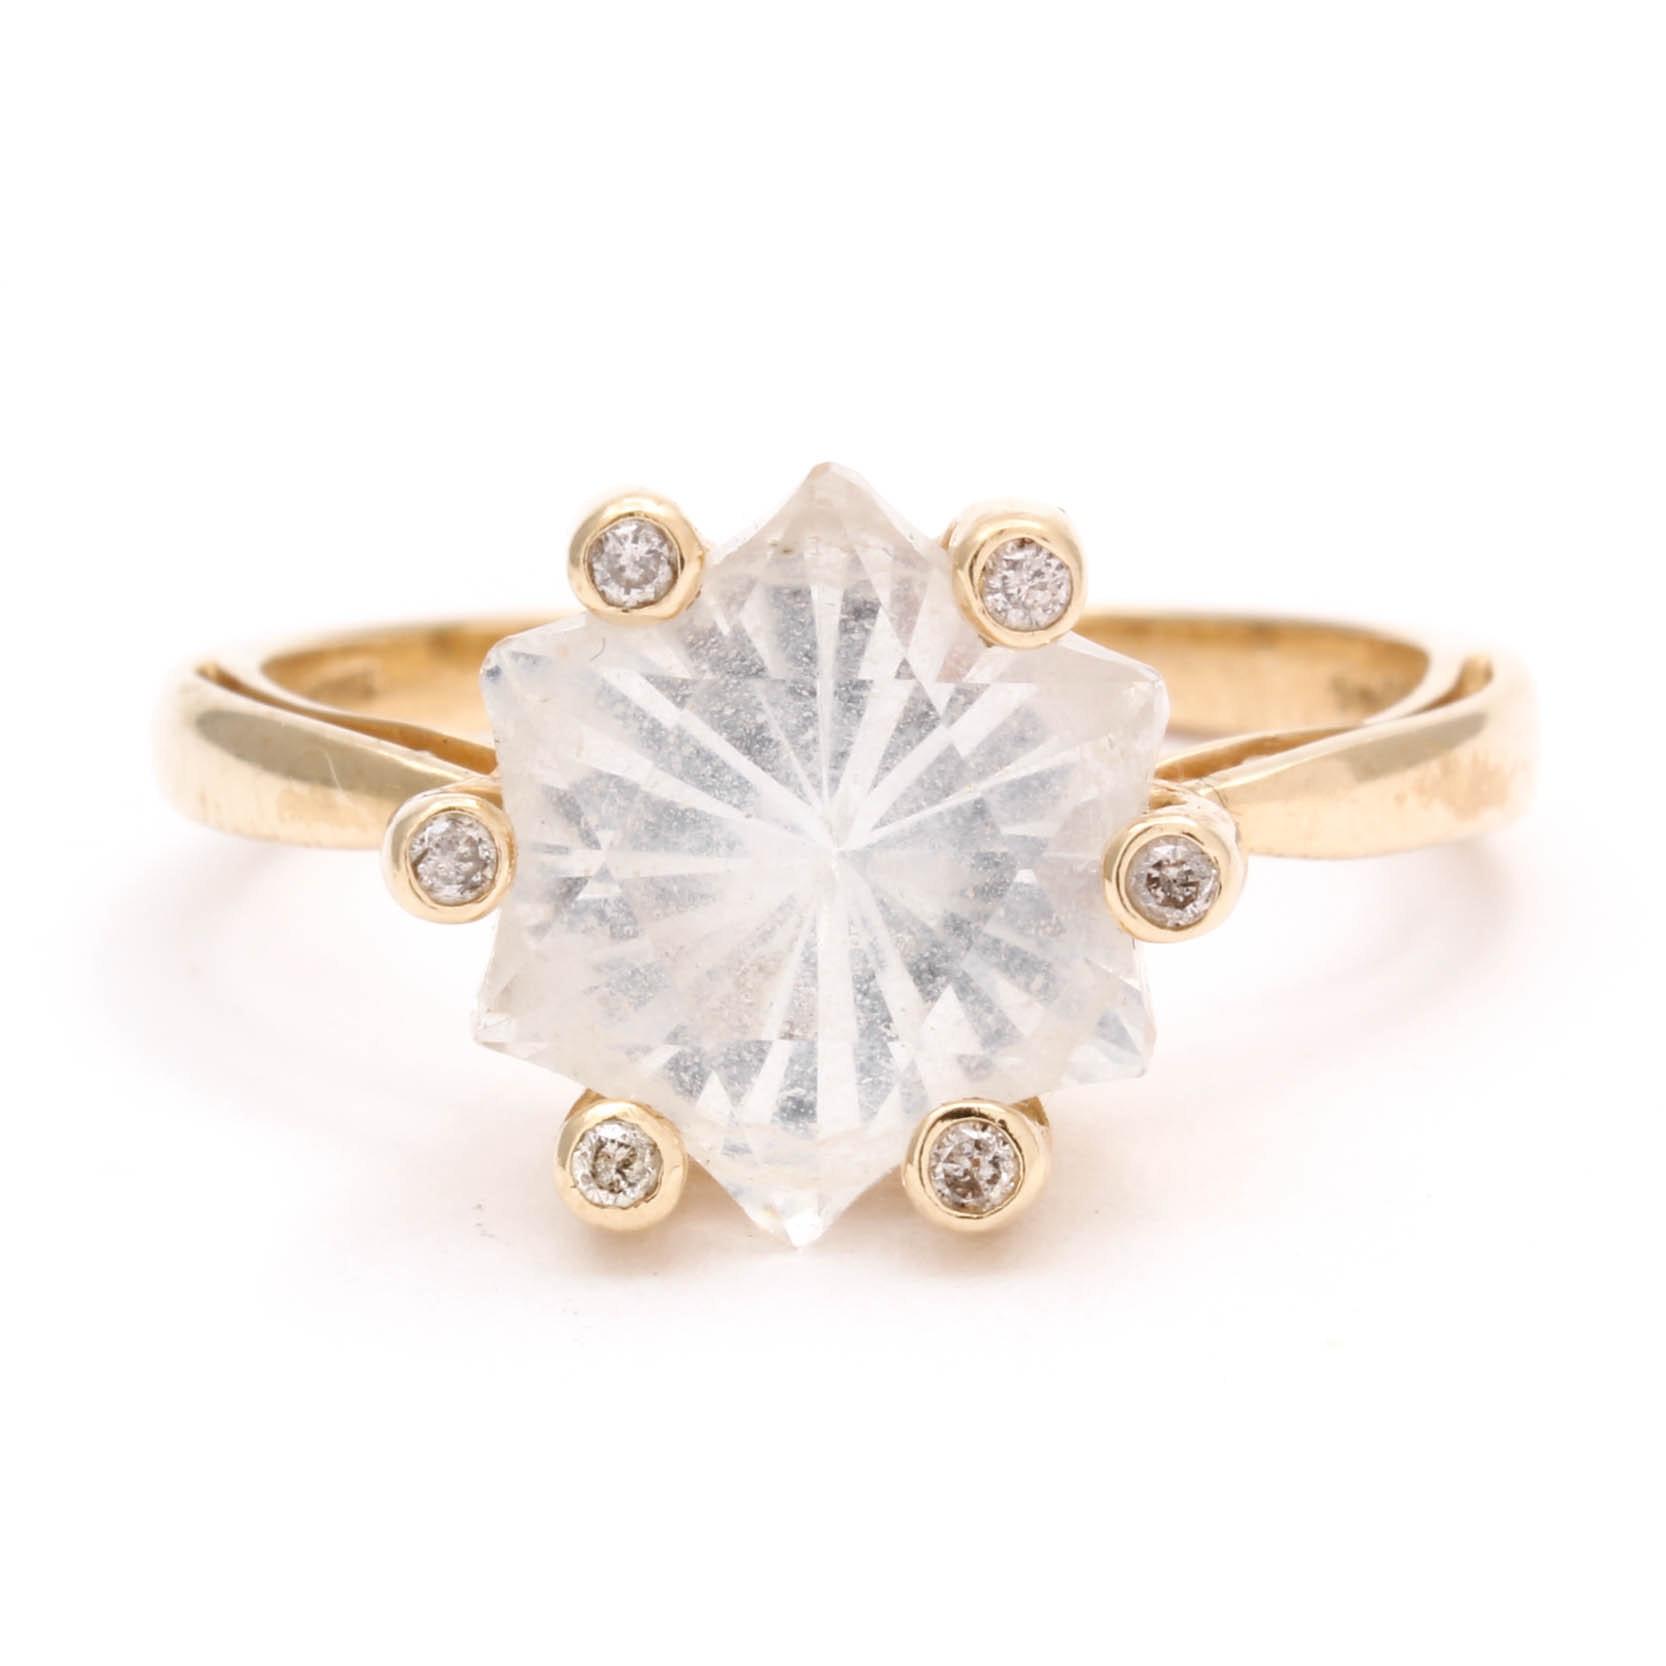 14K Yellow Gold Quartz Ring with Diamond Accents